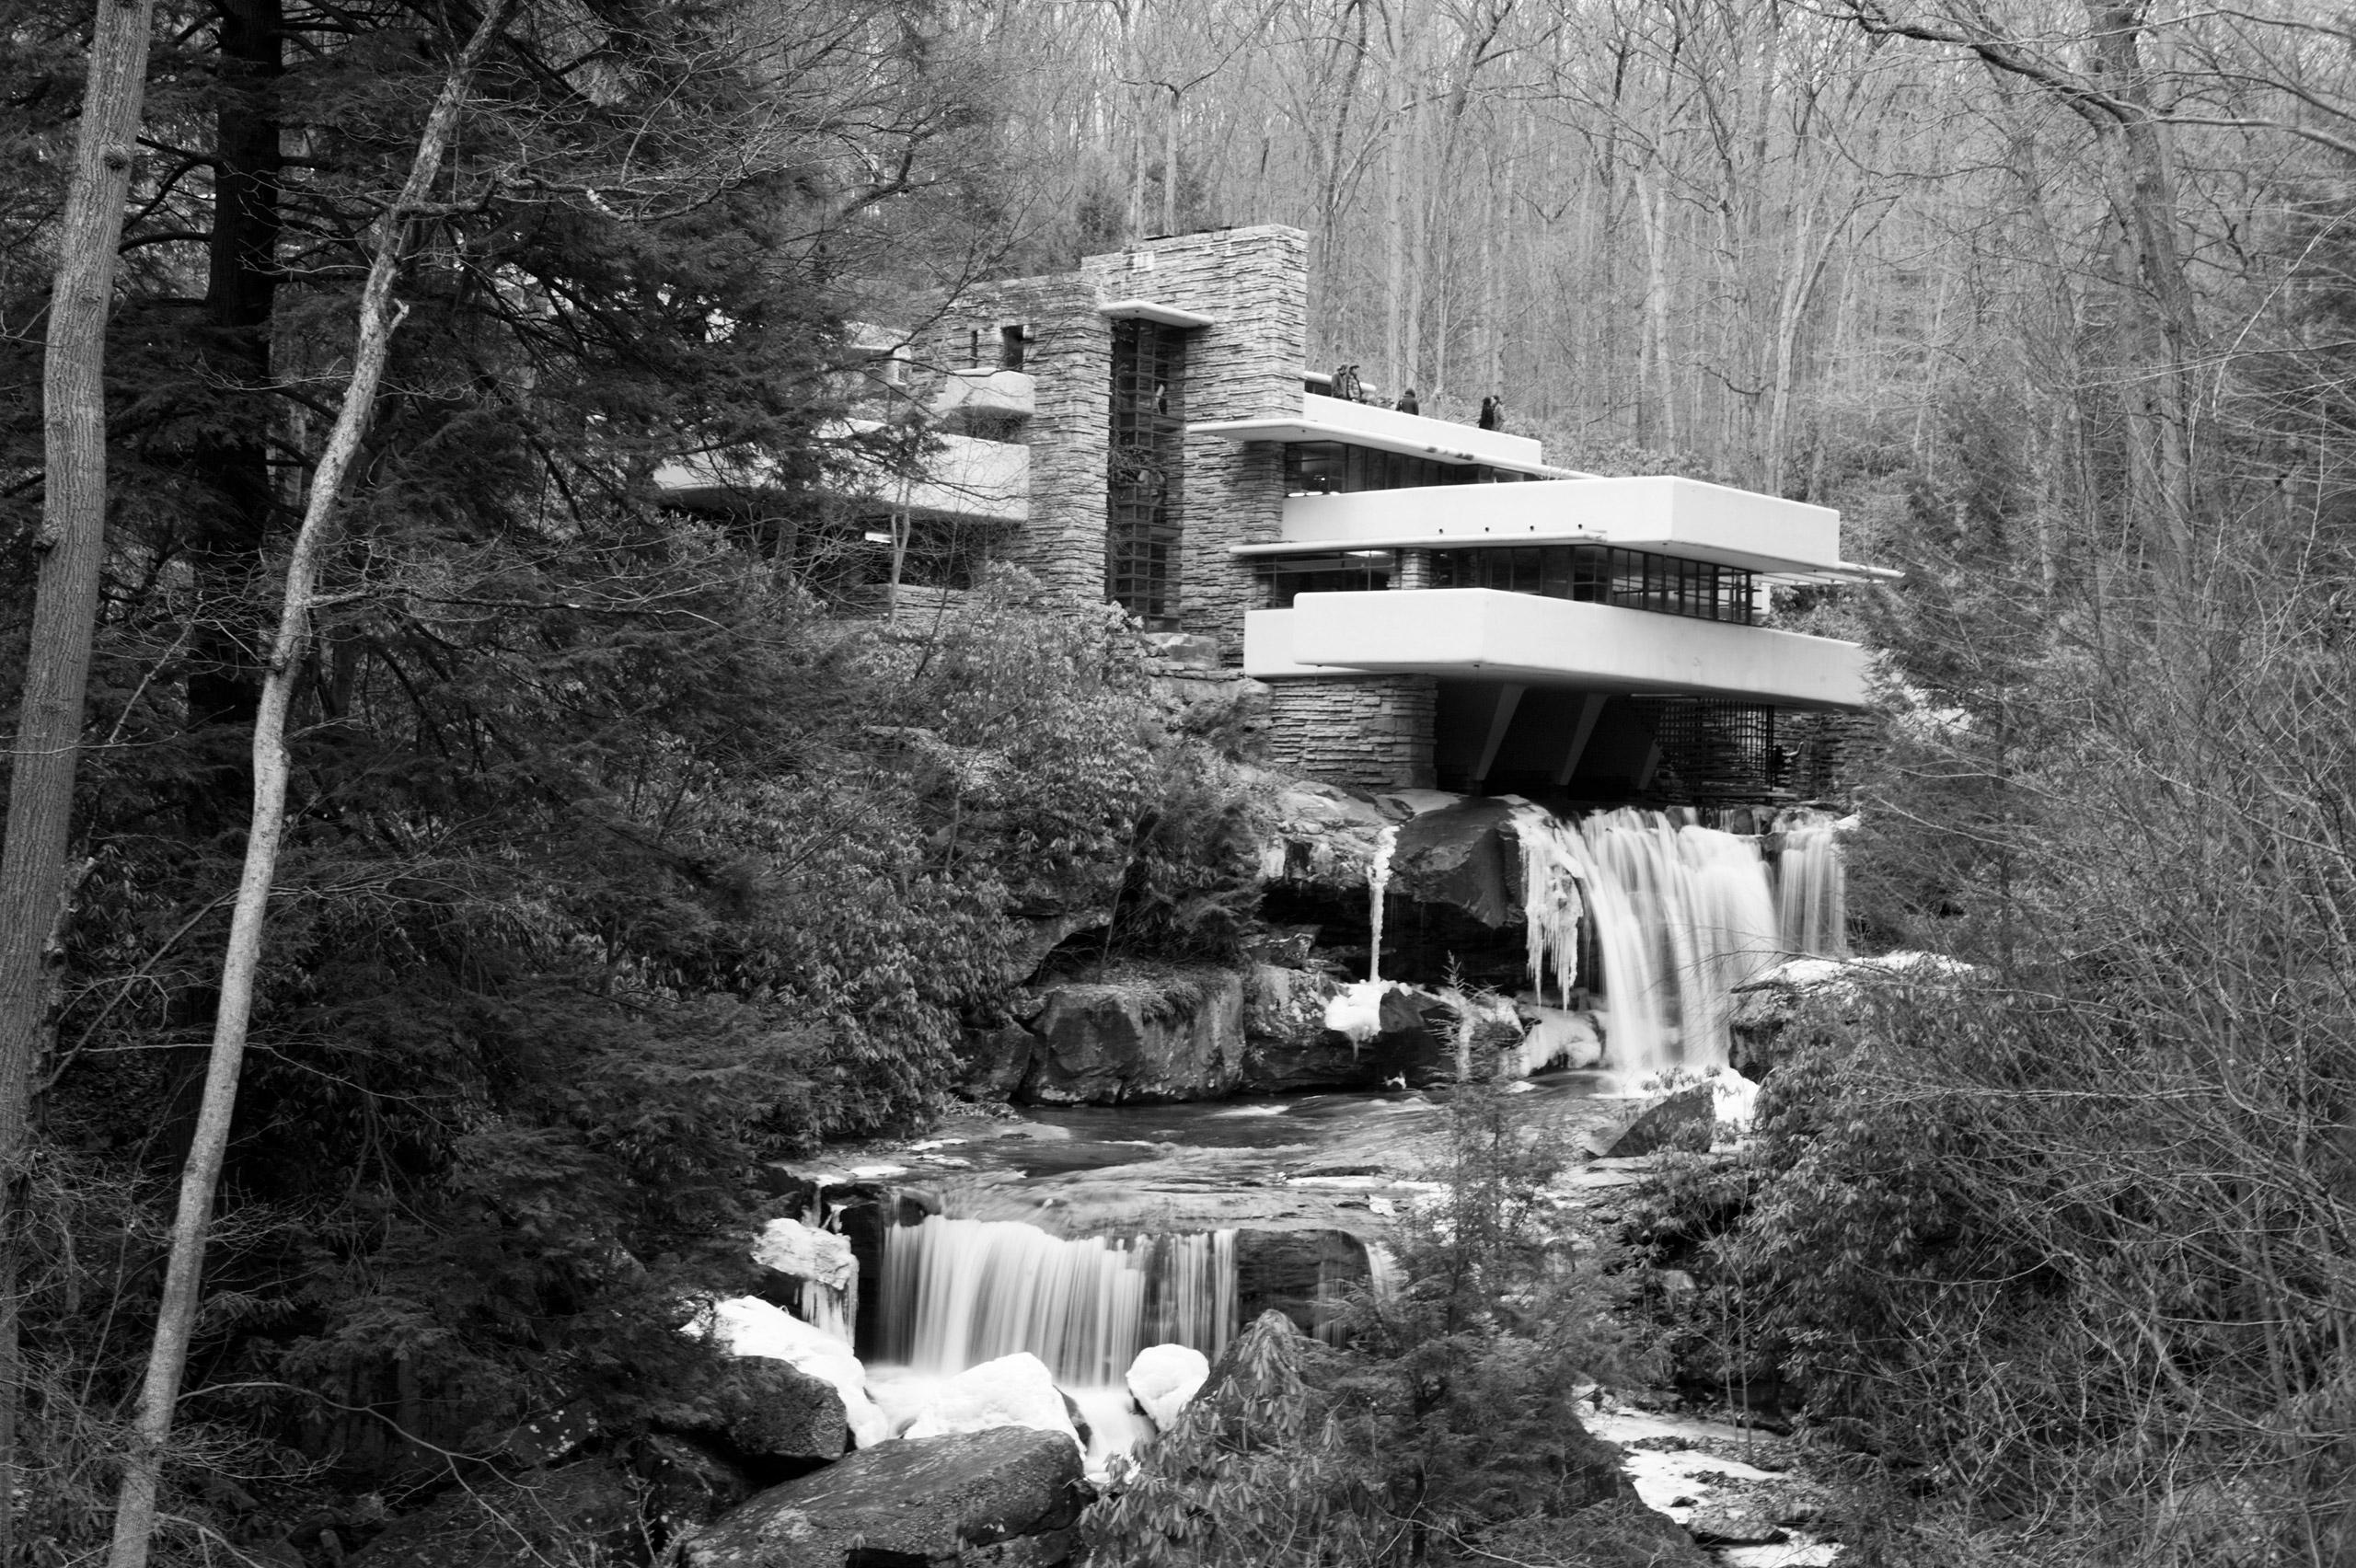 Frank Lloyd Wright's Falling Water house in Mill Run, Penn. Built circa 1936-1939.